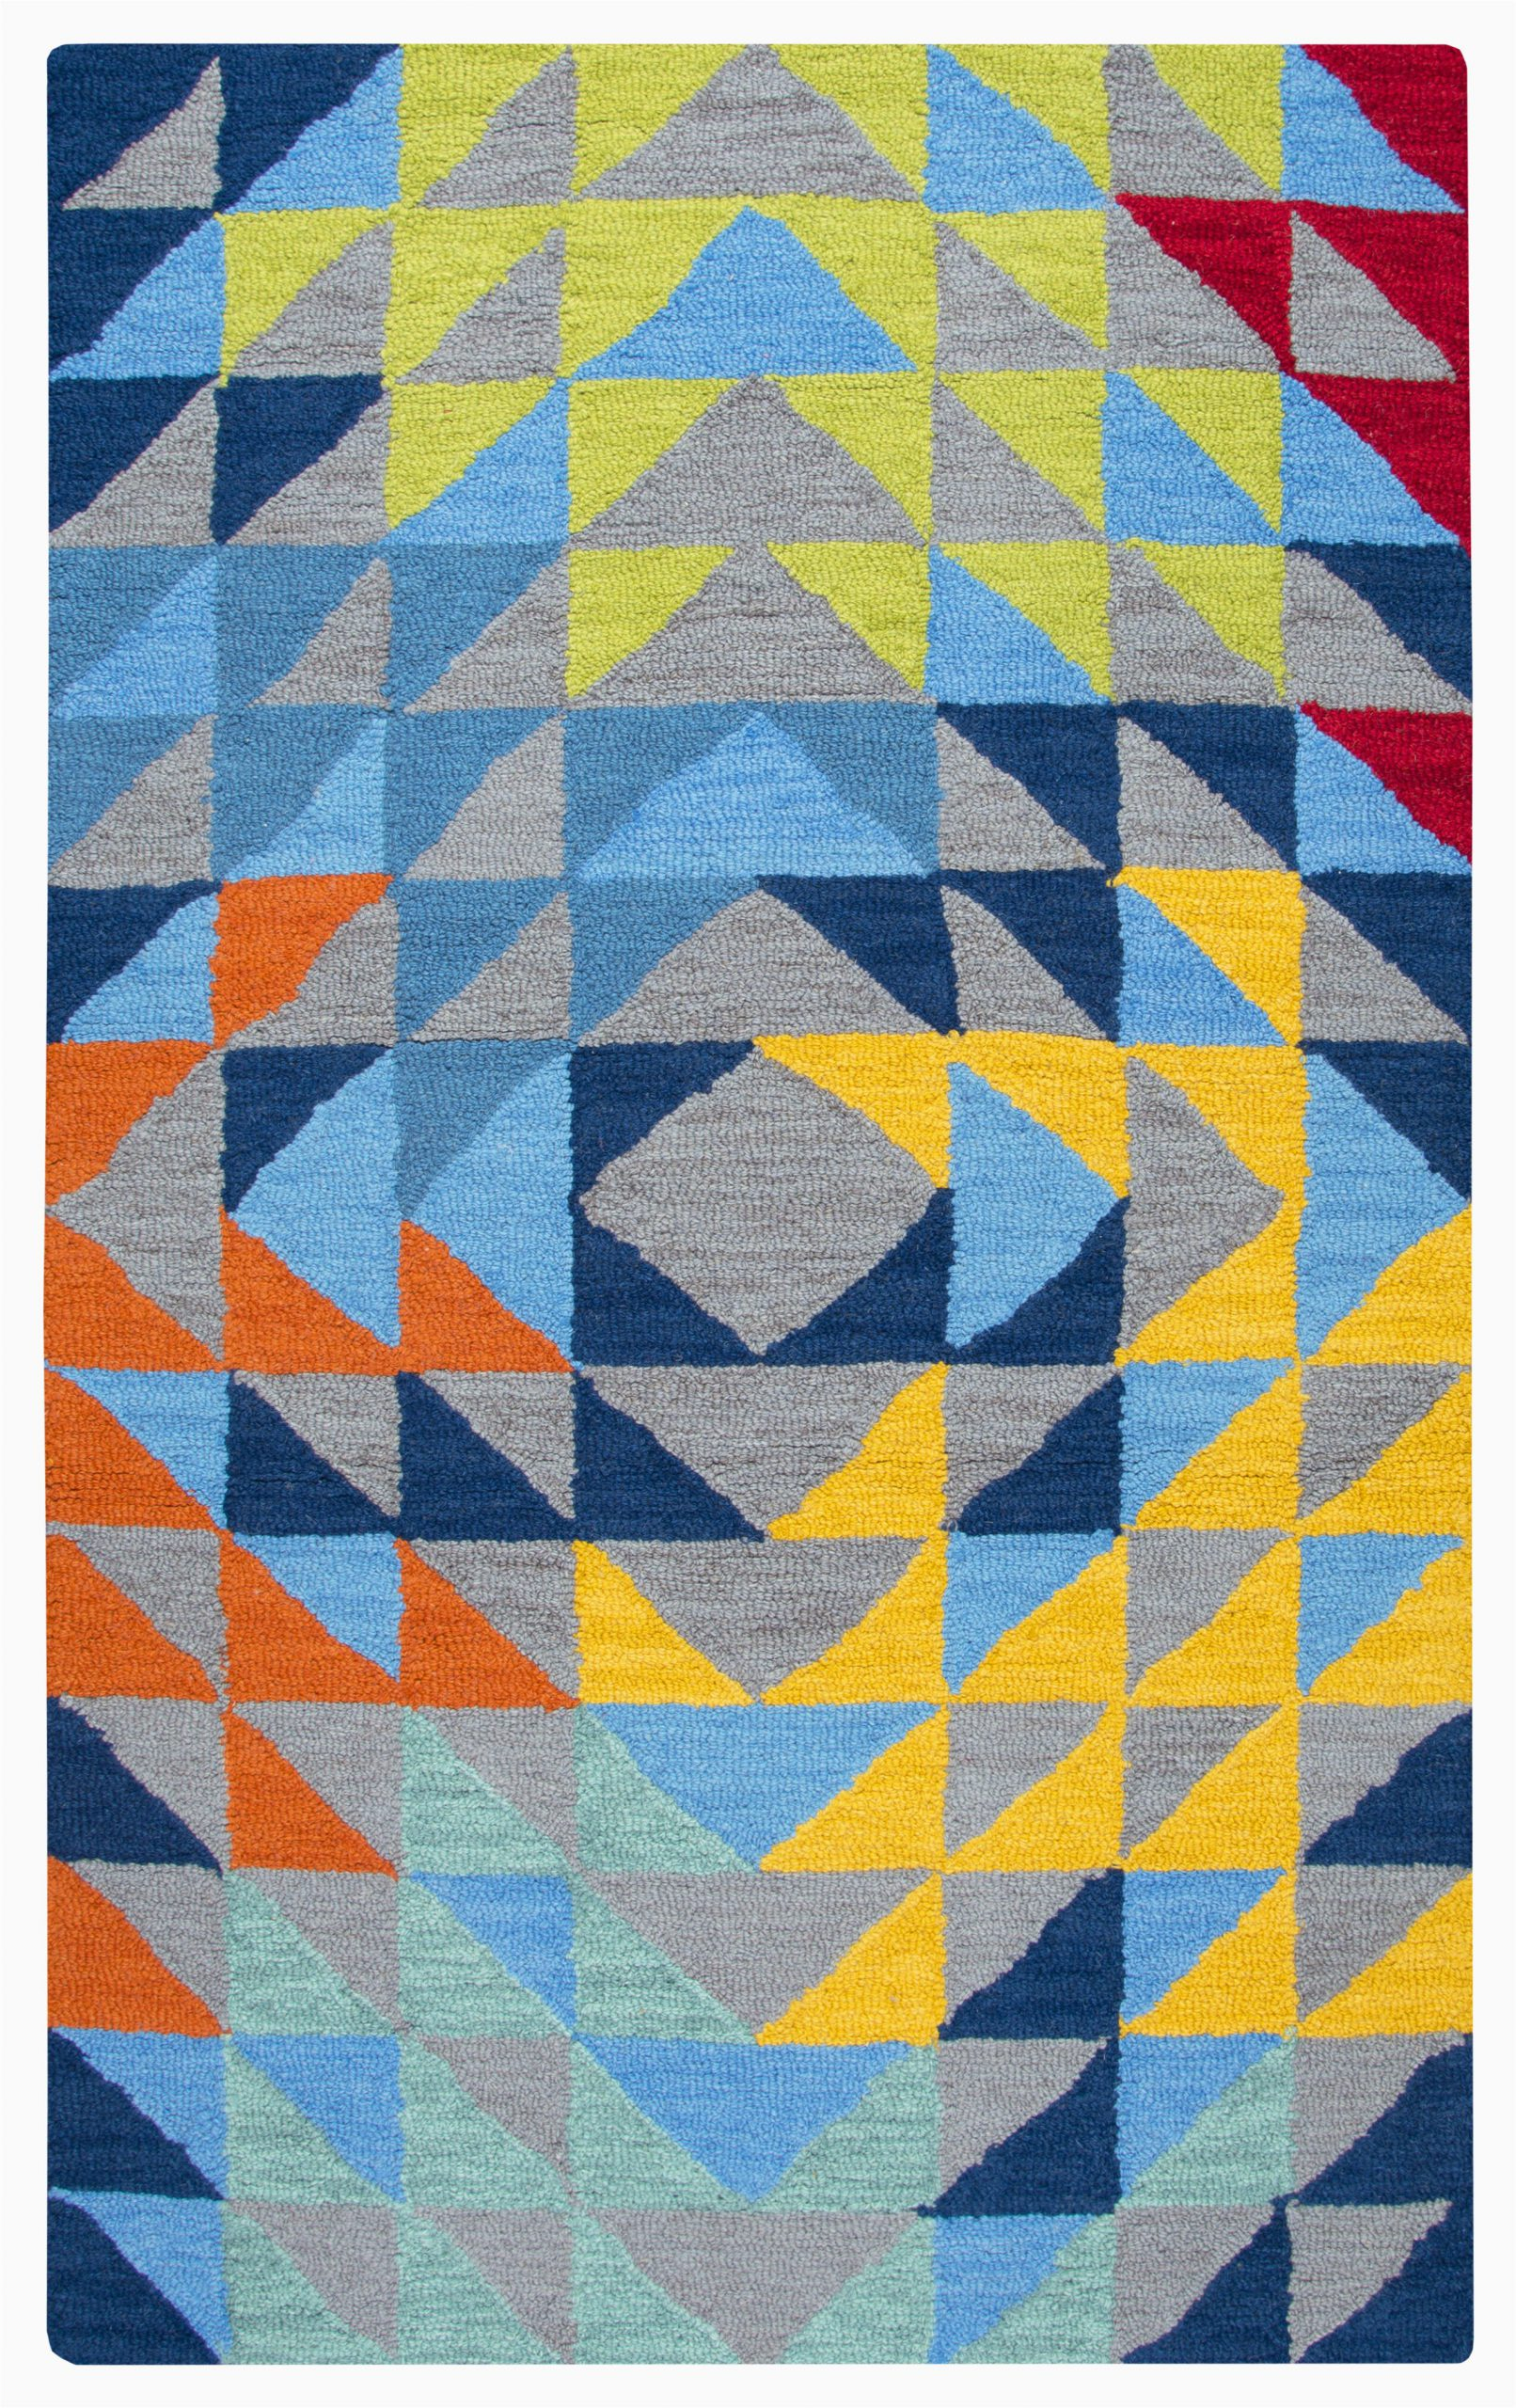 viv rae raquel hand tufted wool grayblue area rug vvro7058 piid=